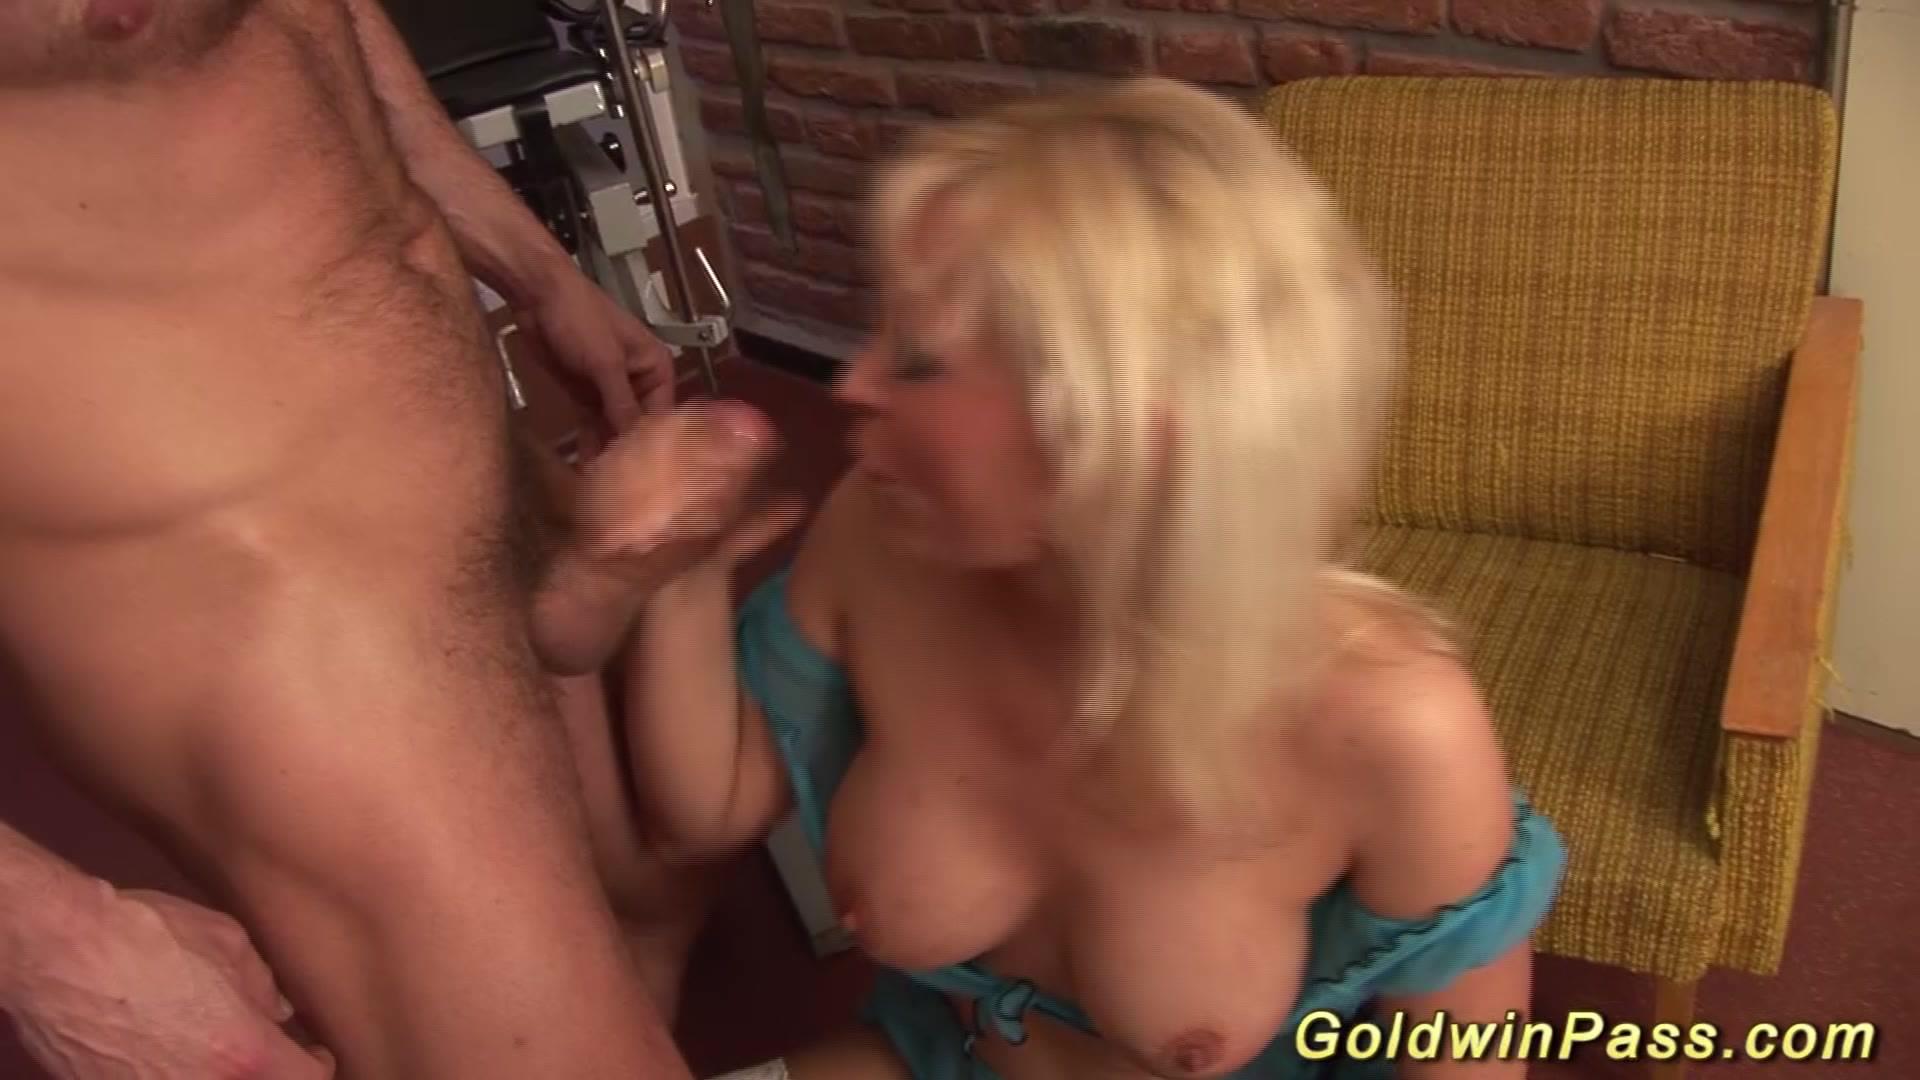 Nude 18+ Delsiena online dating